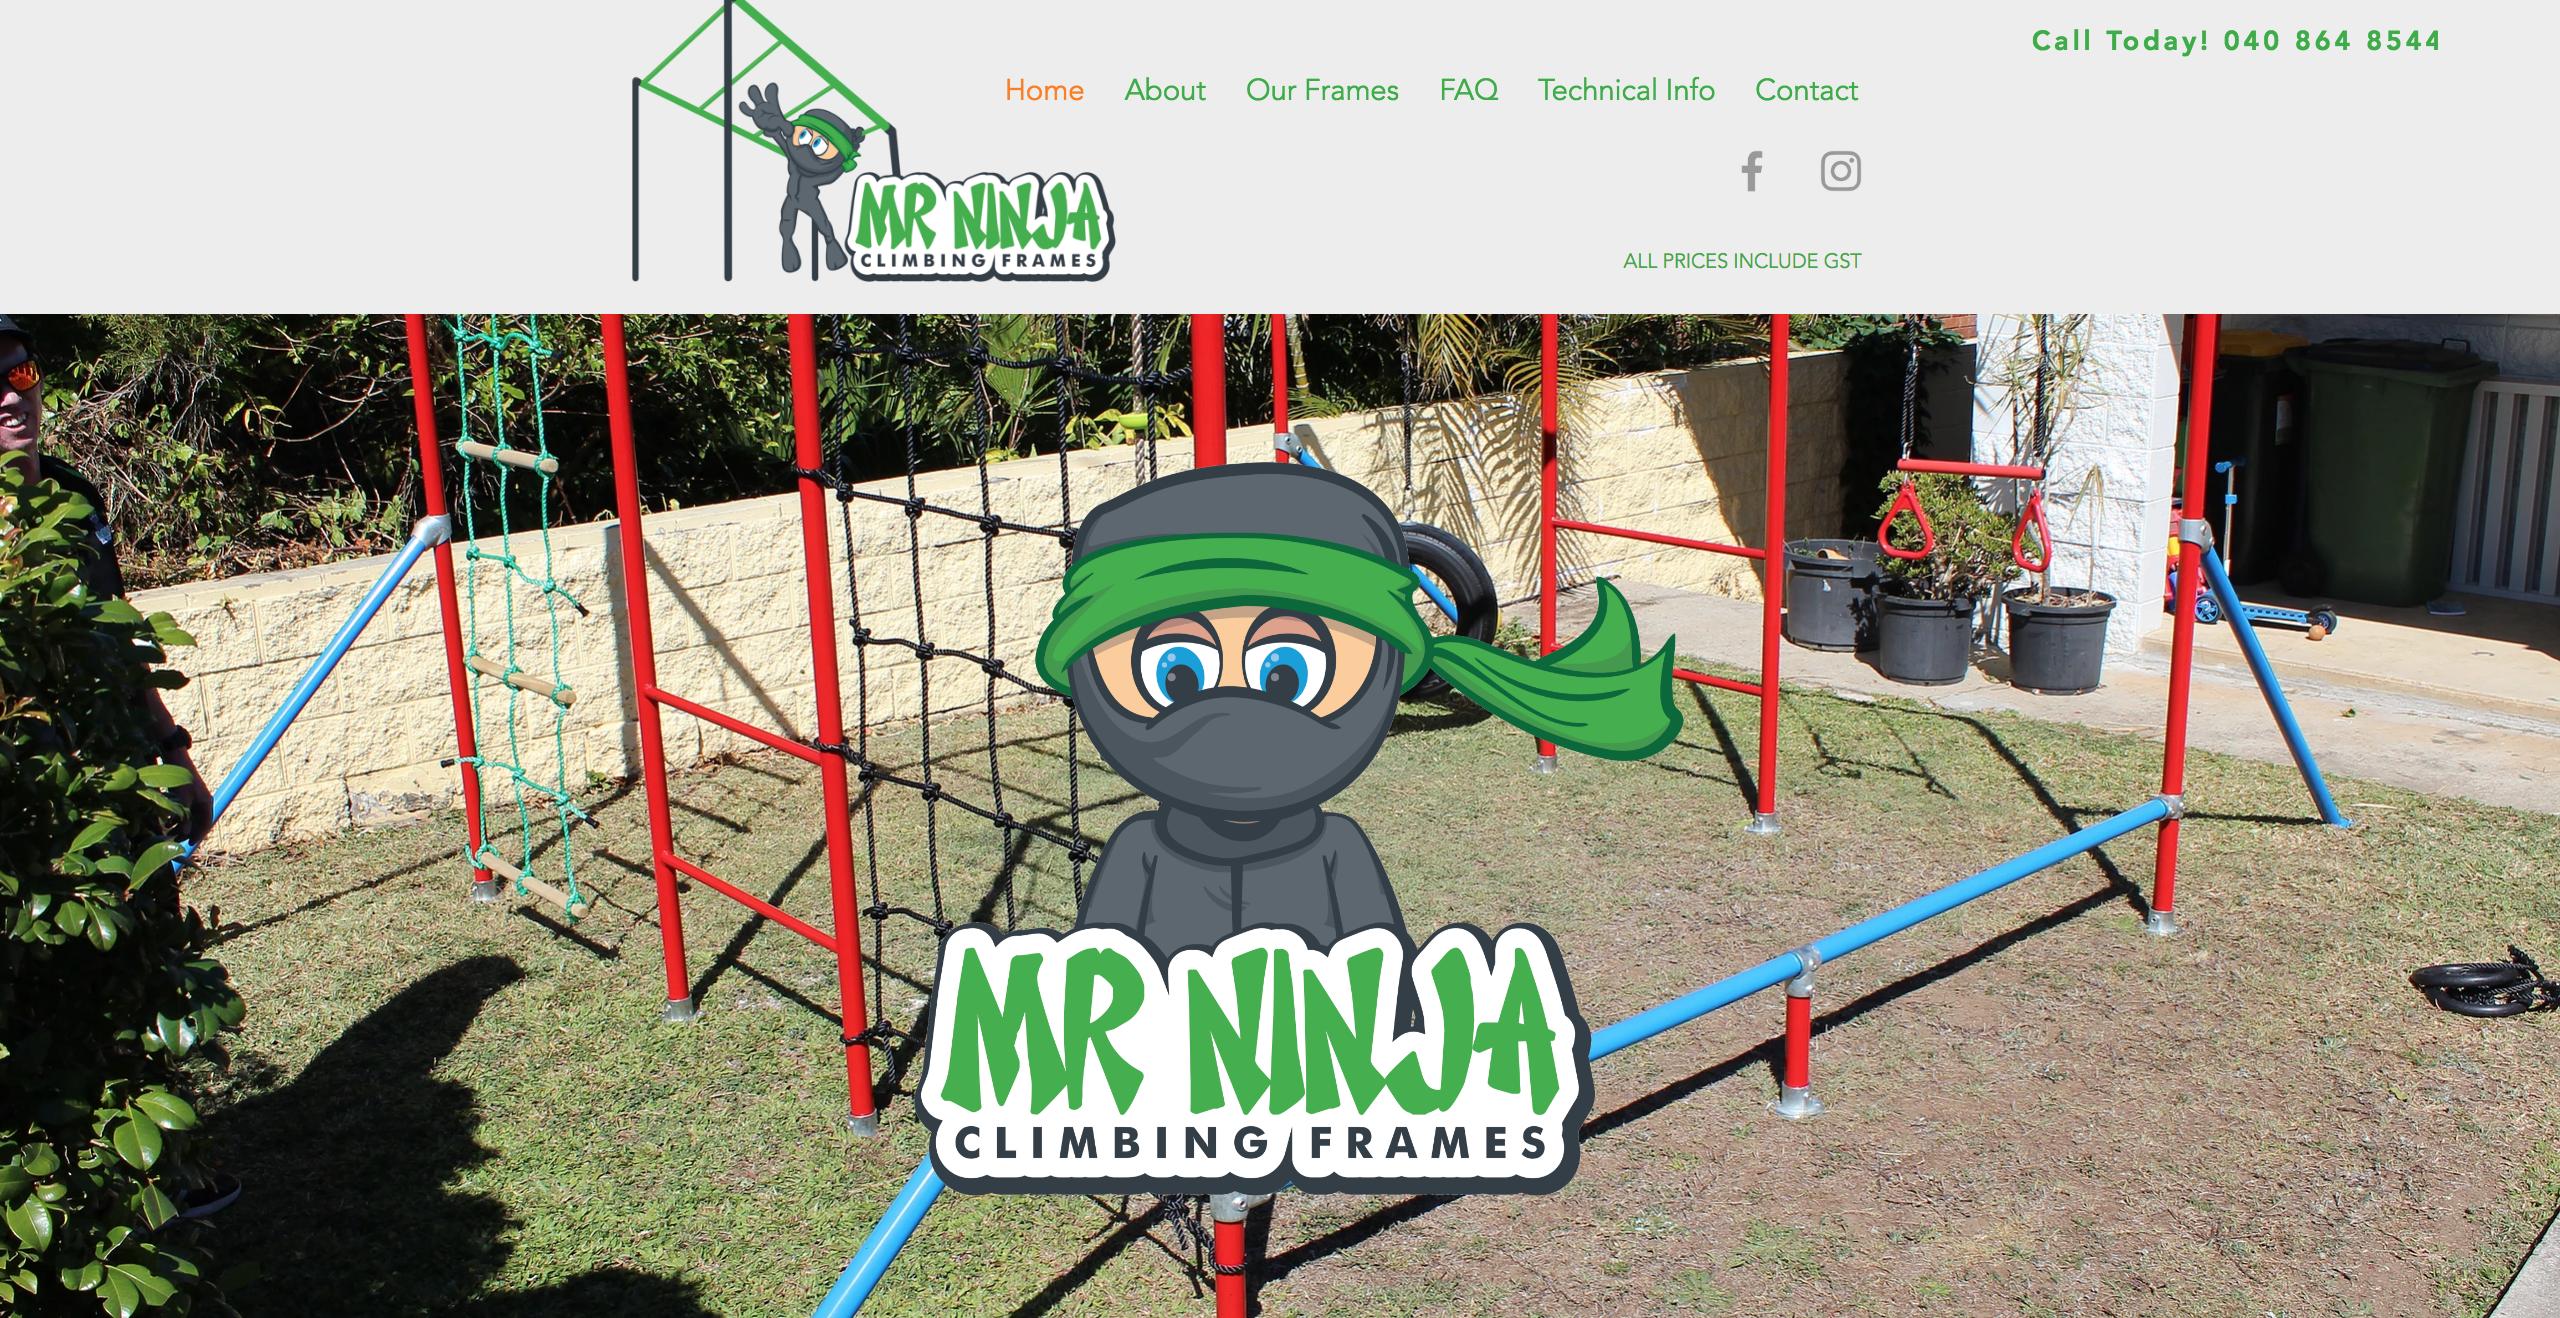 Mr Ninja Climbing Frames - https___www.mrninjaclimbingframes.com.au_